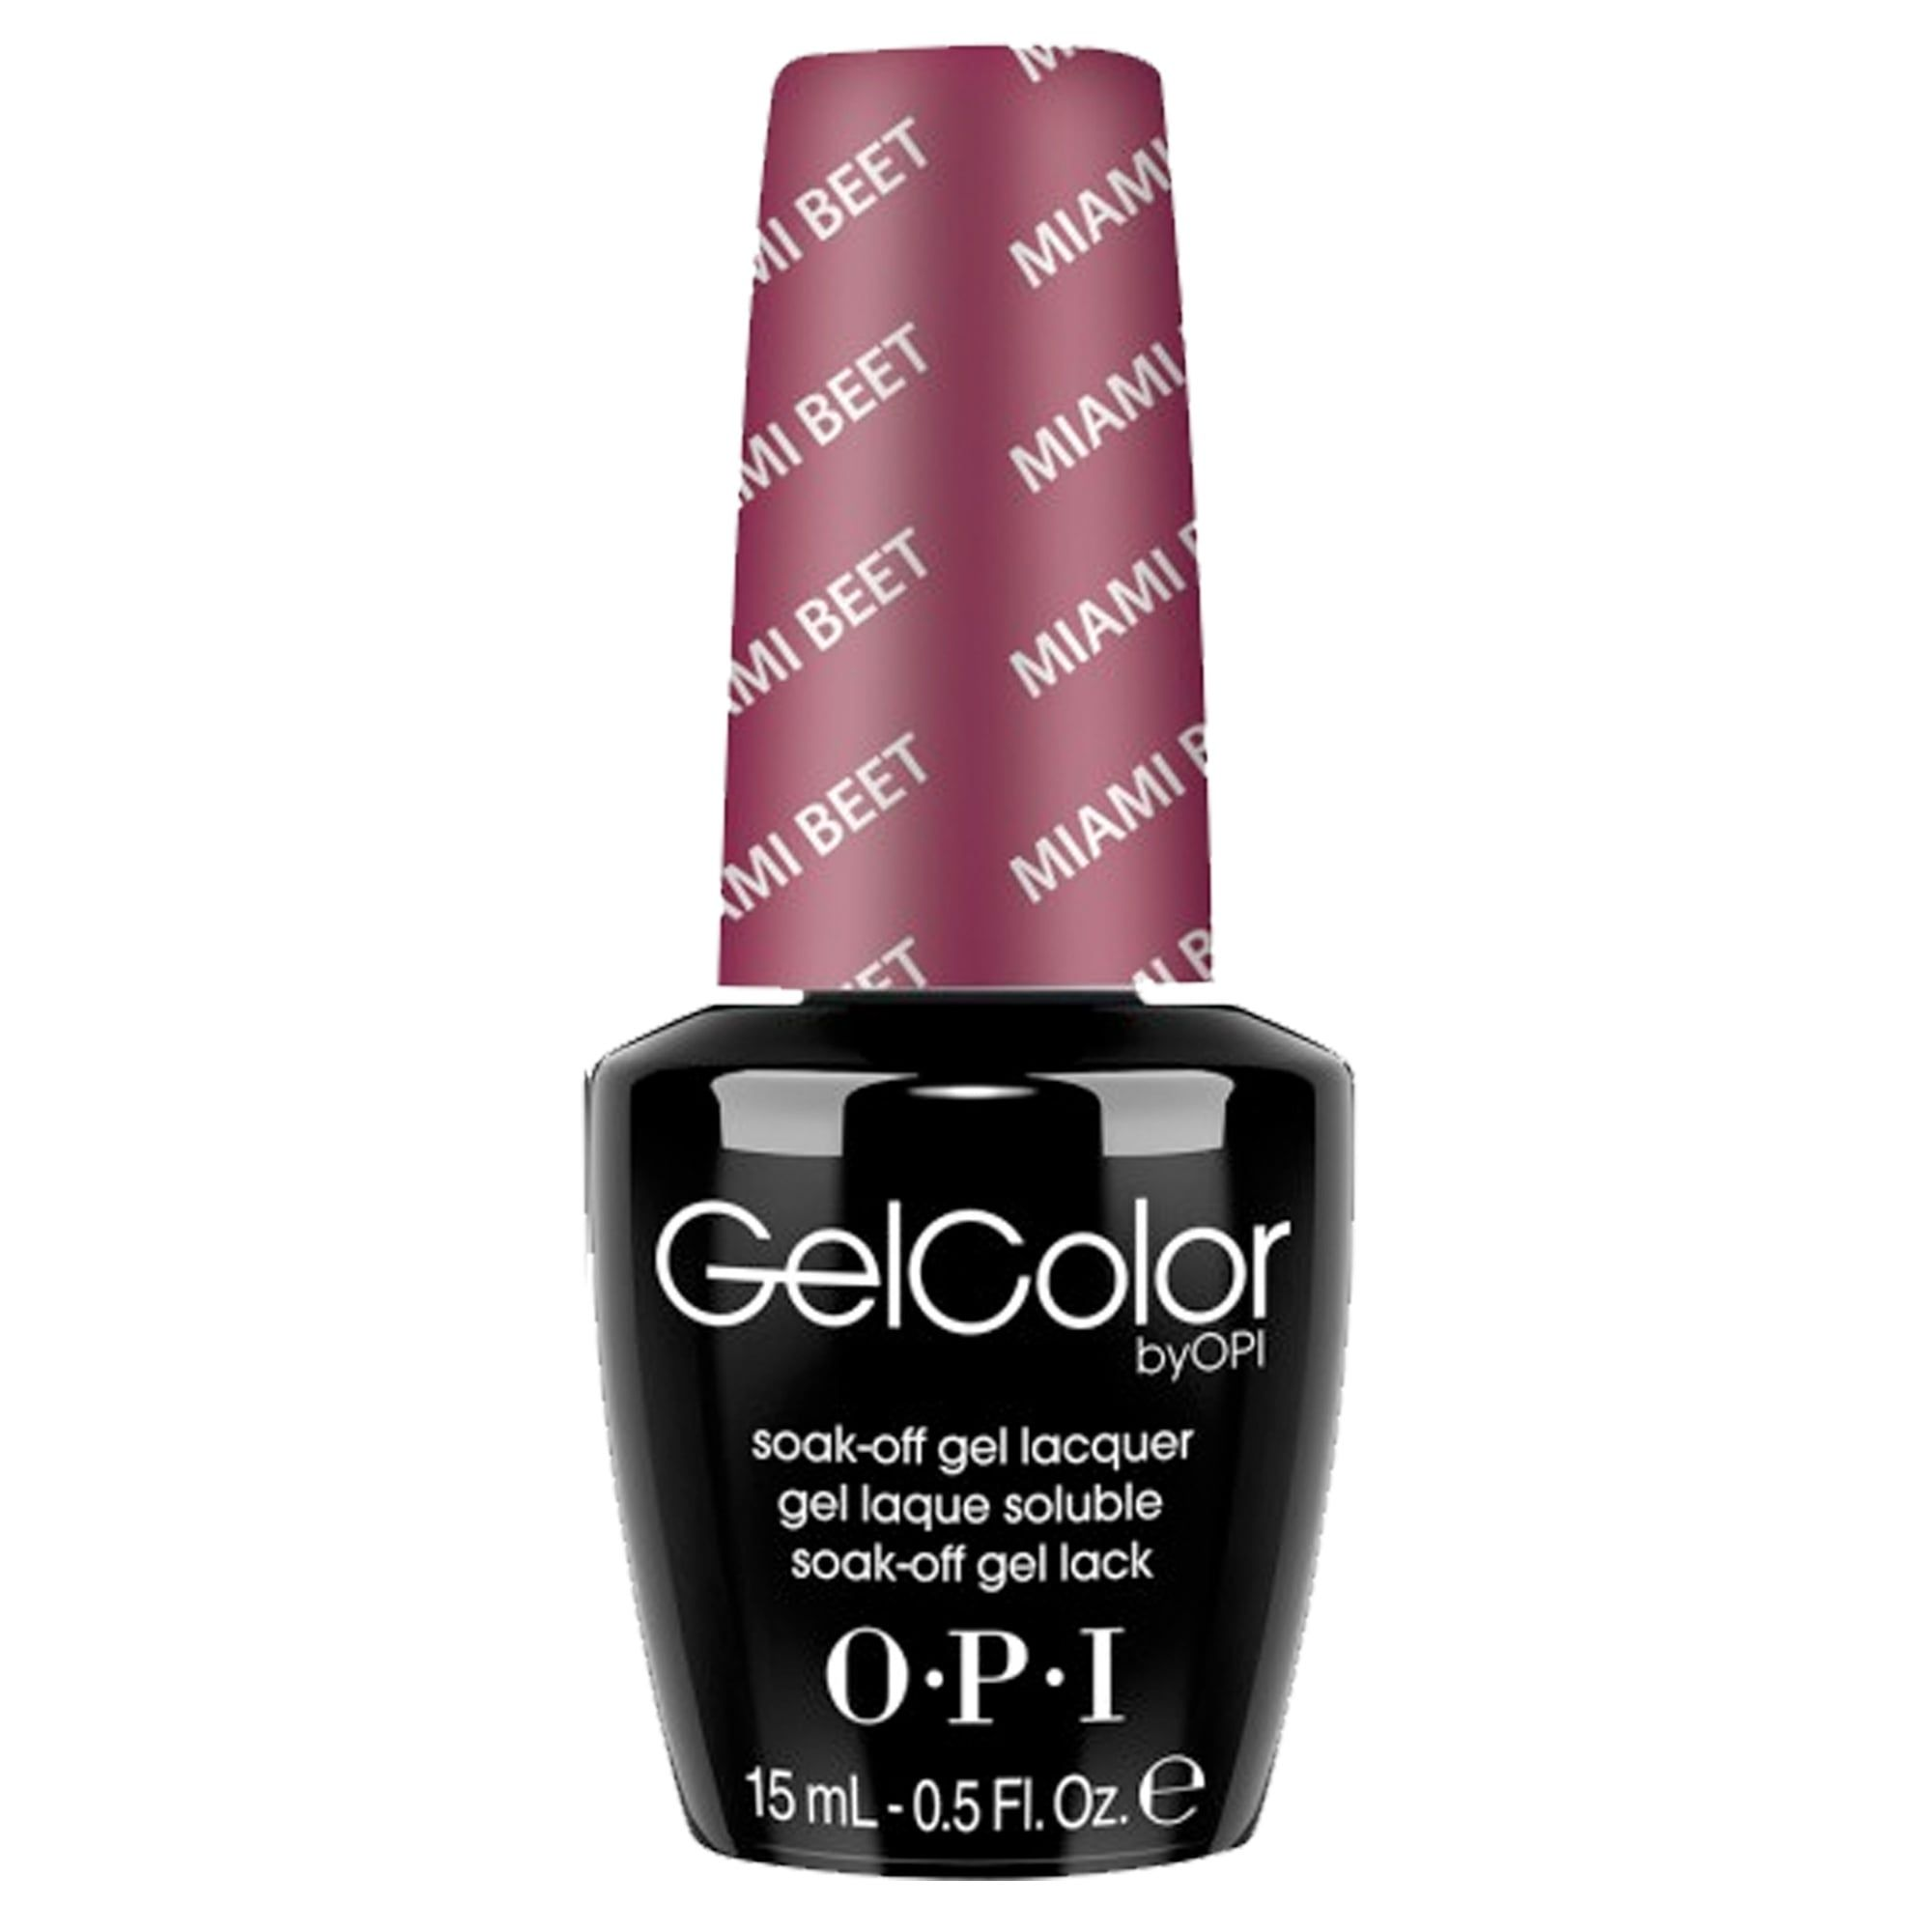 OPI Gel Color - Soak off Gel Polish - Miami Beet 15ml (GC B78 ...